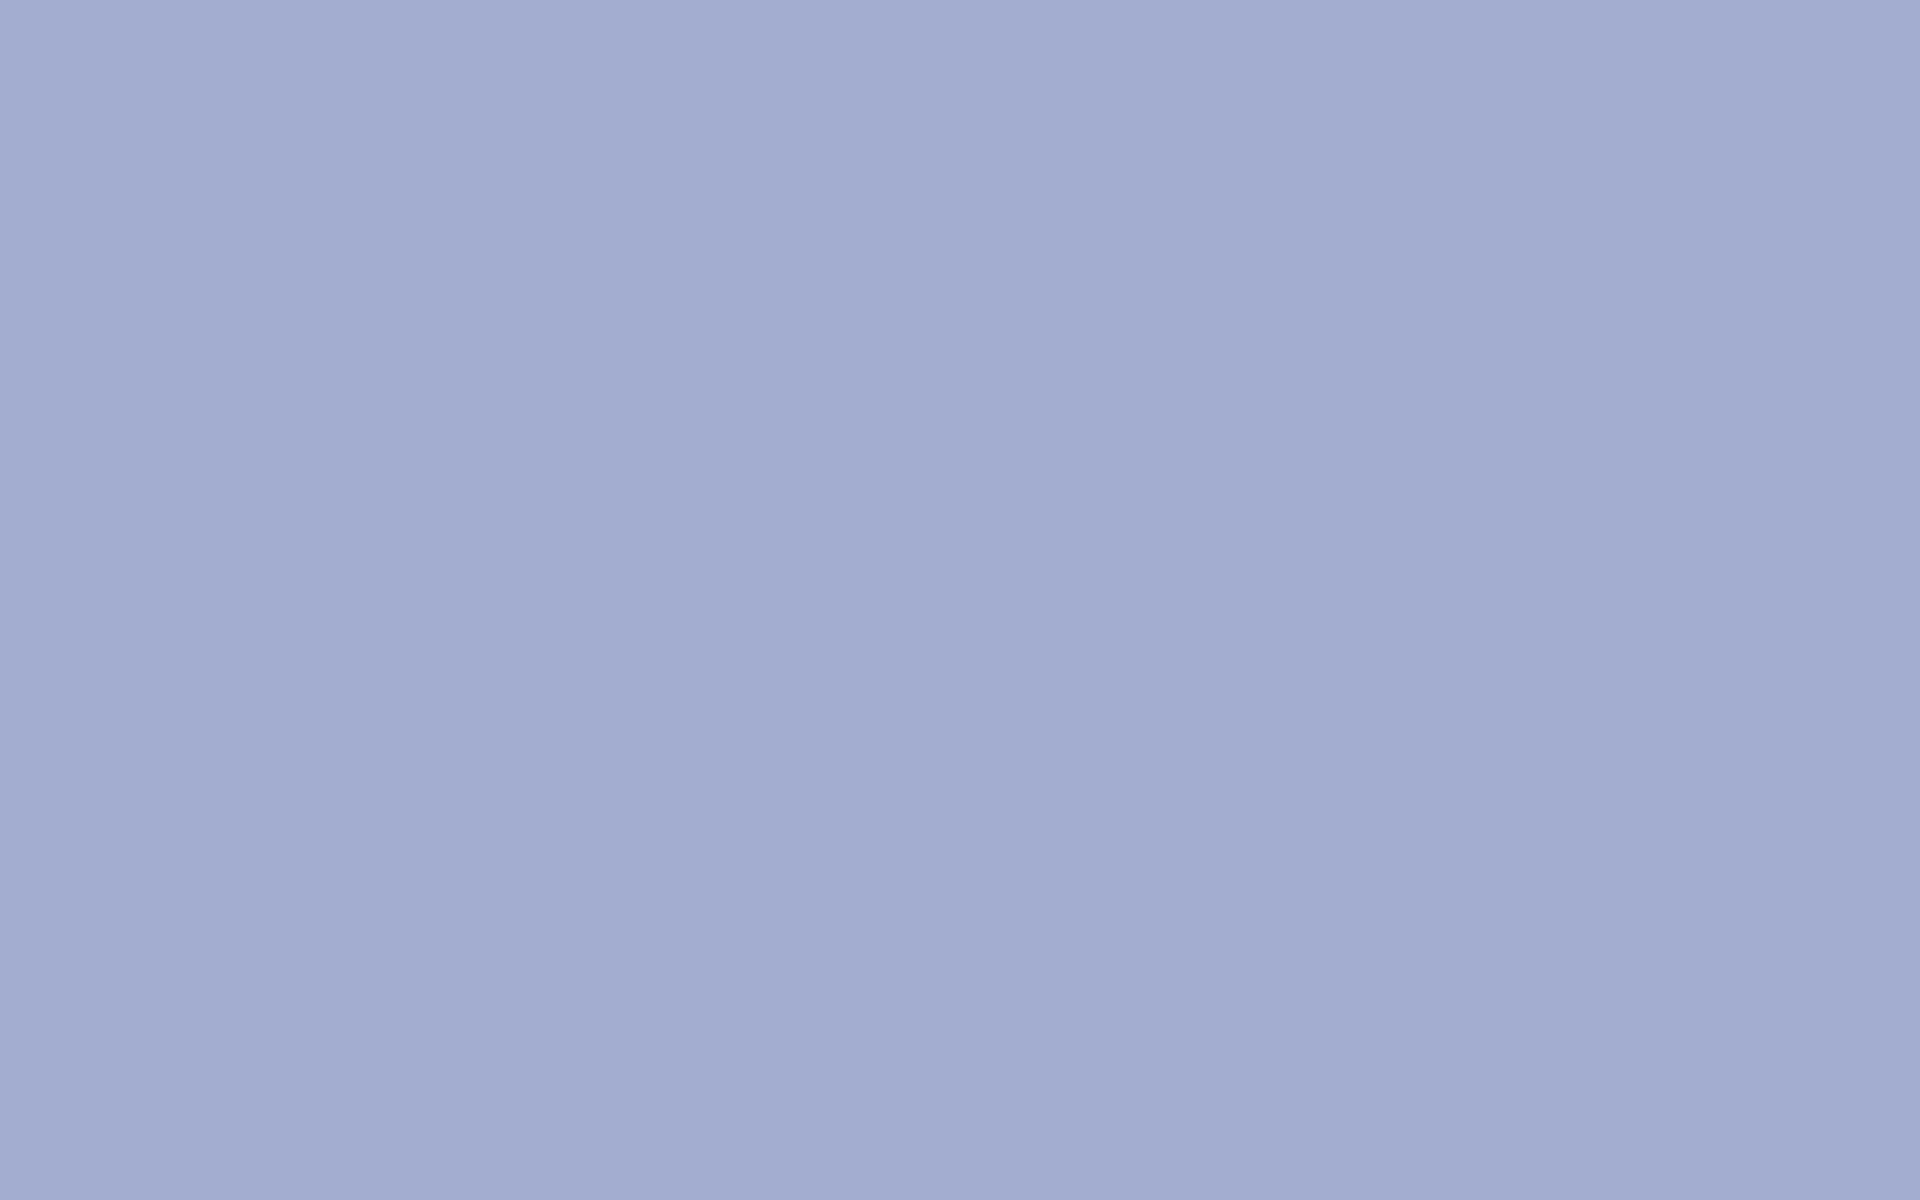 1920x1200 Wild Blue Yonder Solid Color Background